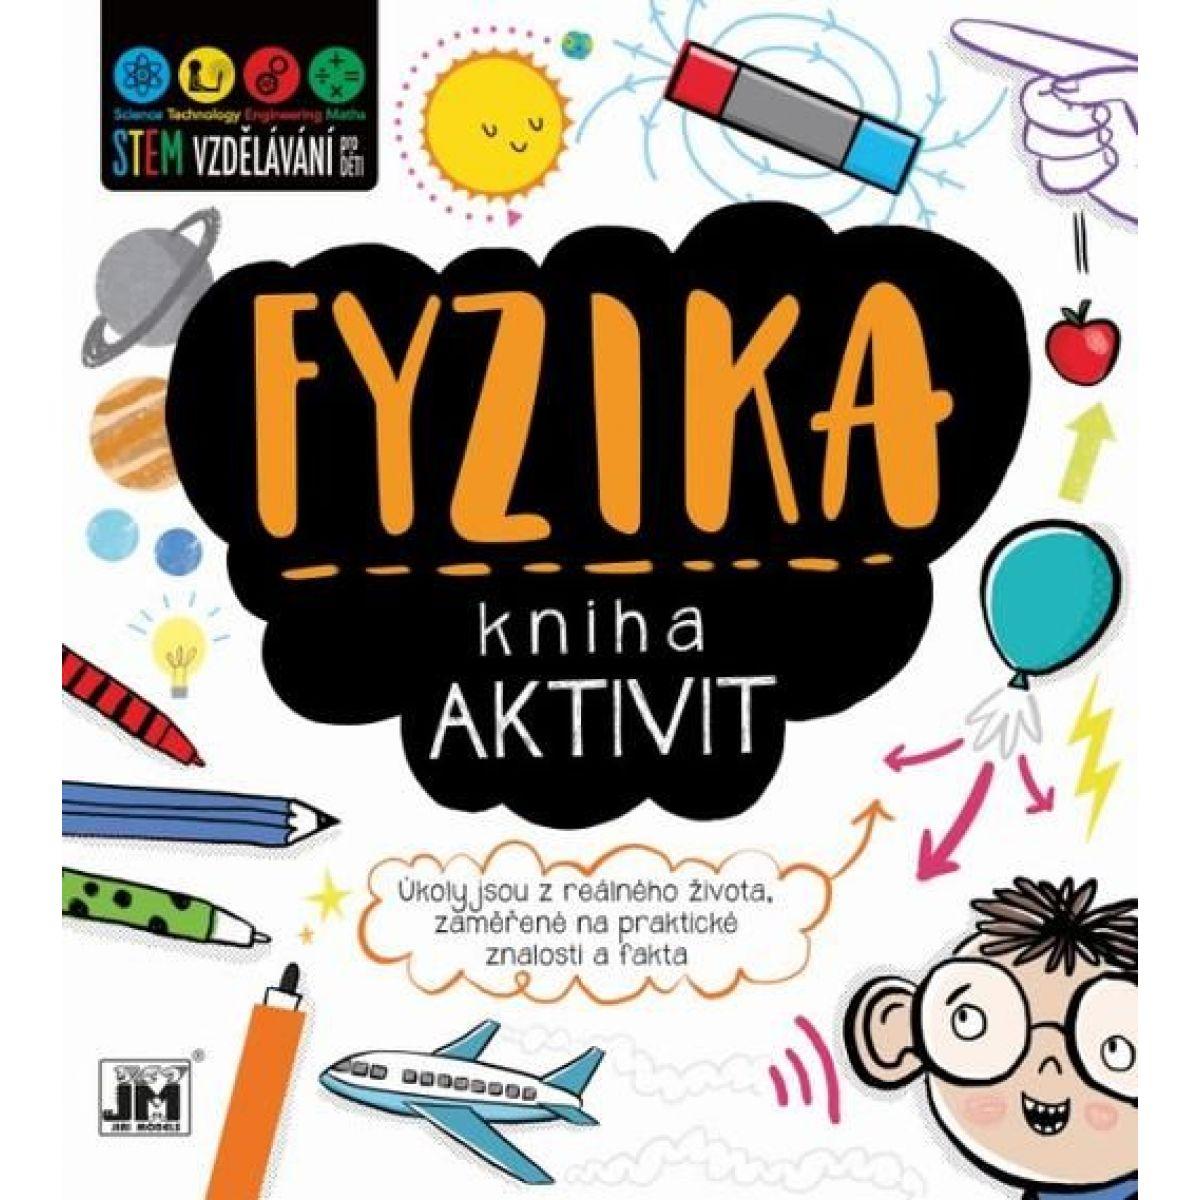 Jiri Models Kniha aktivít Fyzika